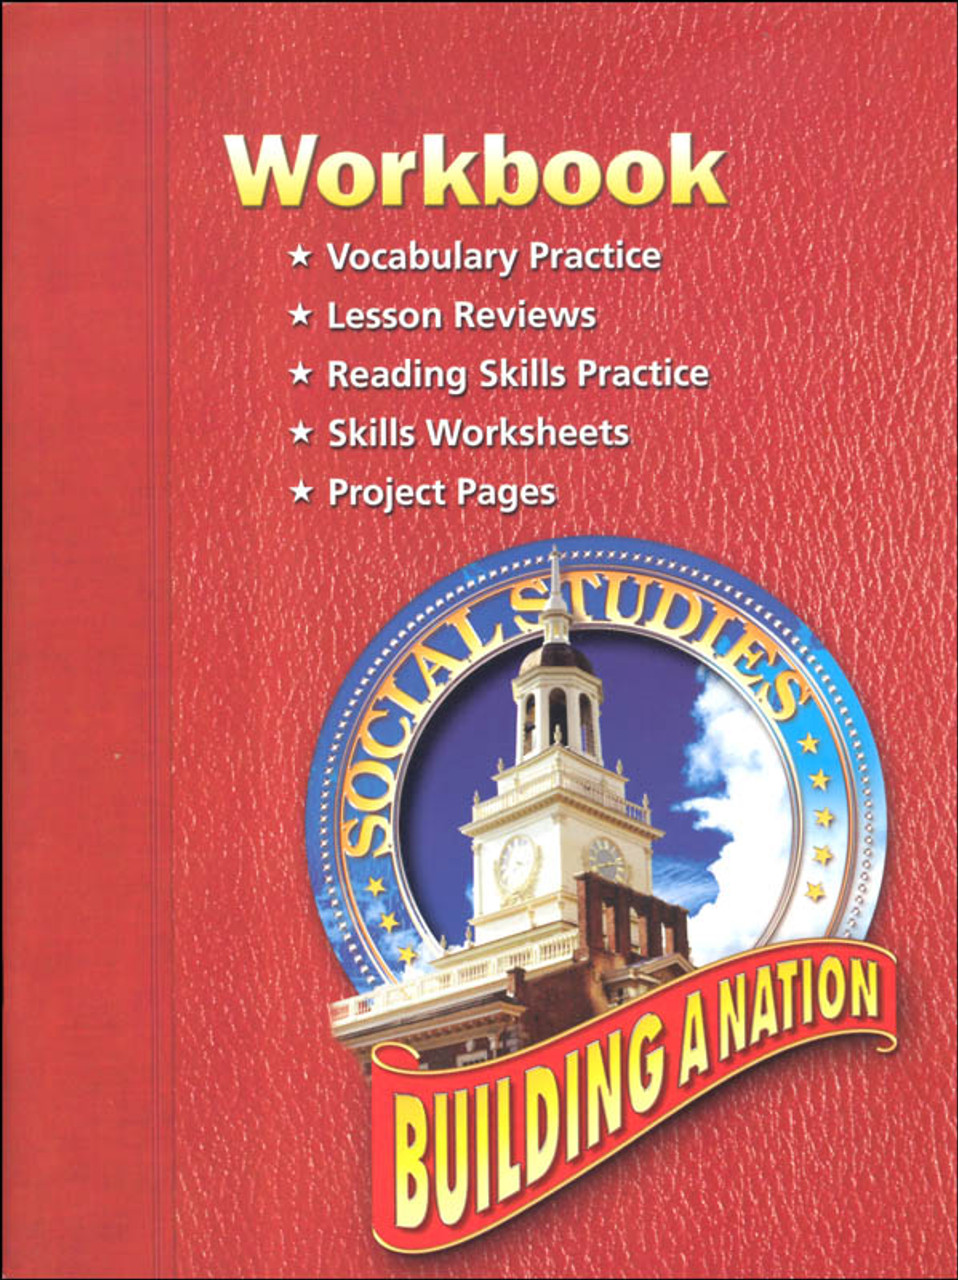 Scott Foresman Social Studies Grade 6 Student Workbook - Building A Nation  - Classroom Resource Center [ 1280 x 958 Pixel ]